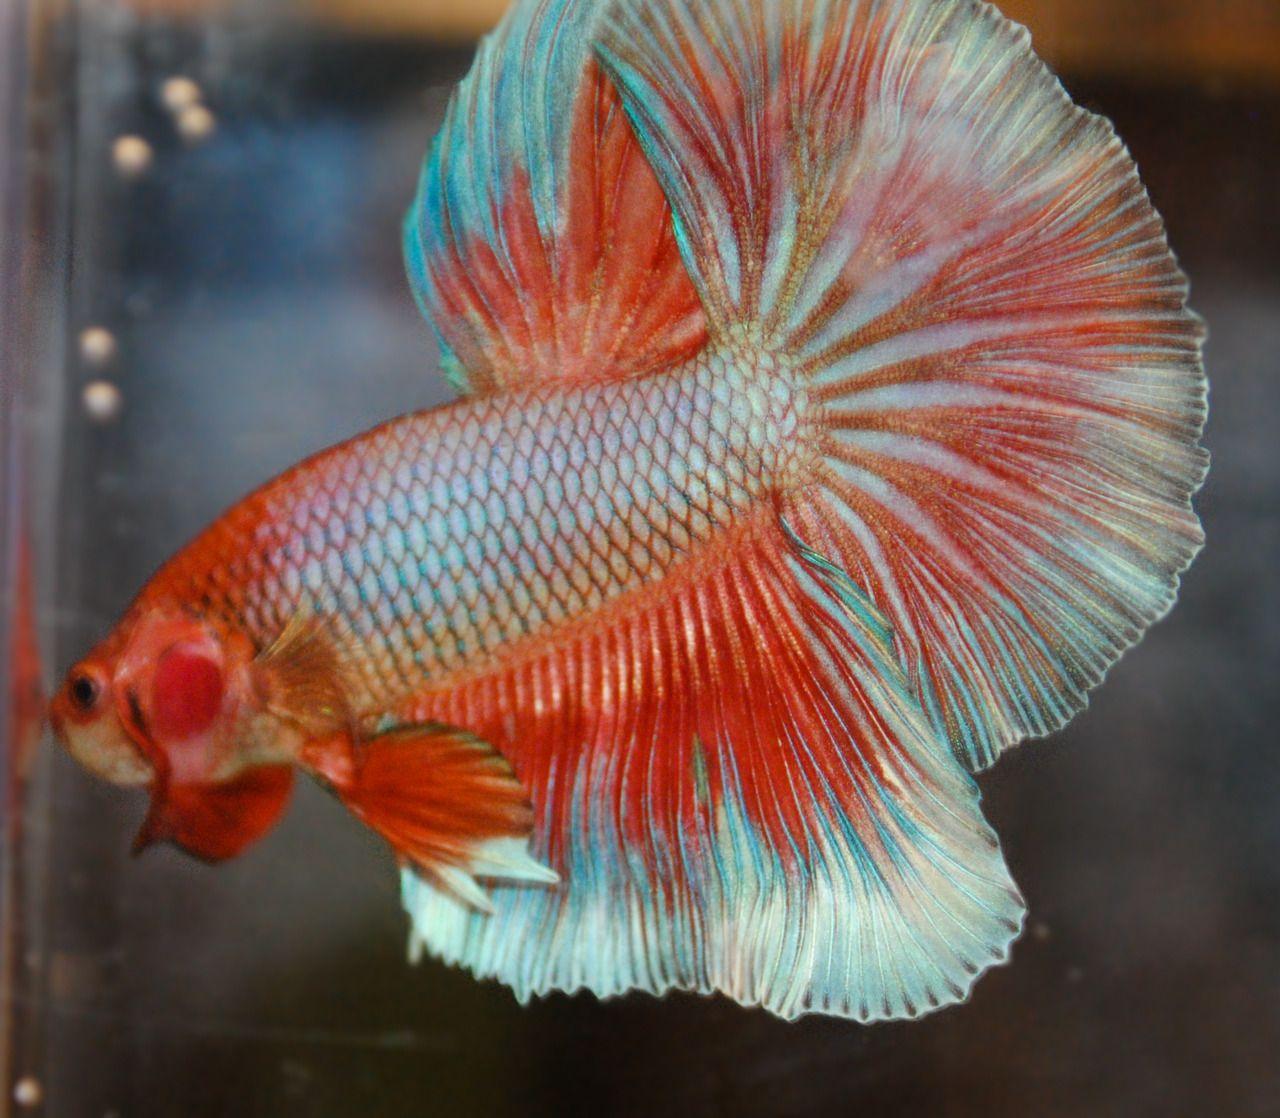 Love this color | Bettas | Pinterest | Betta, Betta fish and Fish tanks